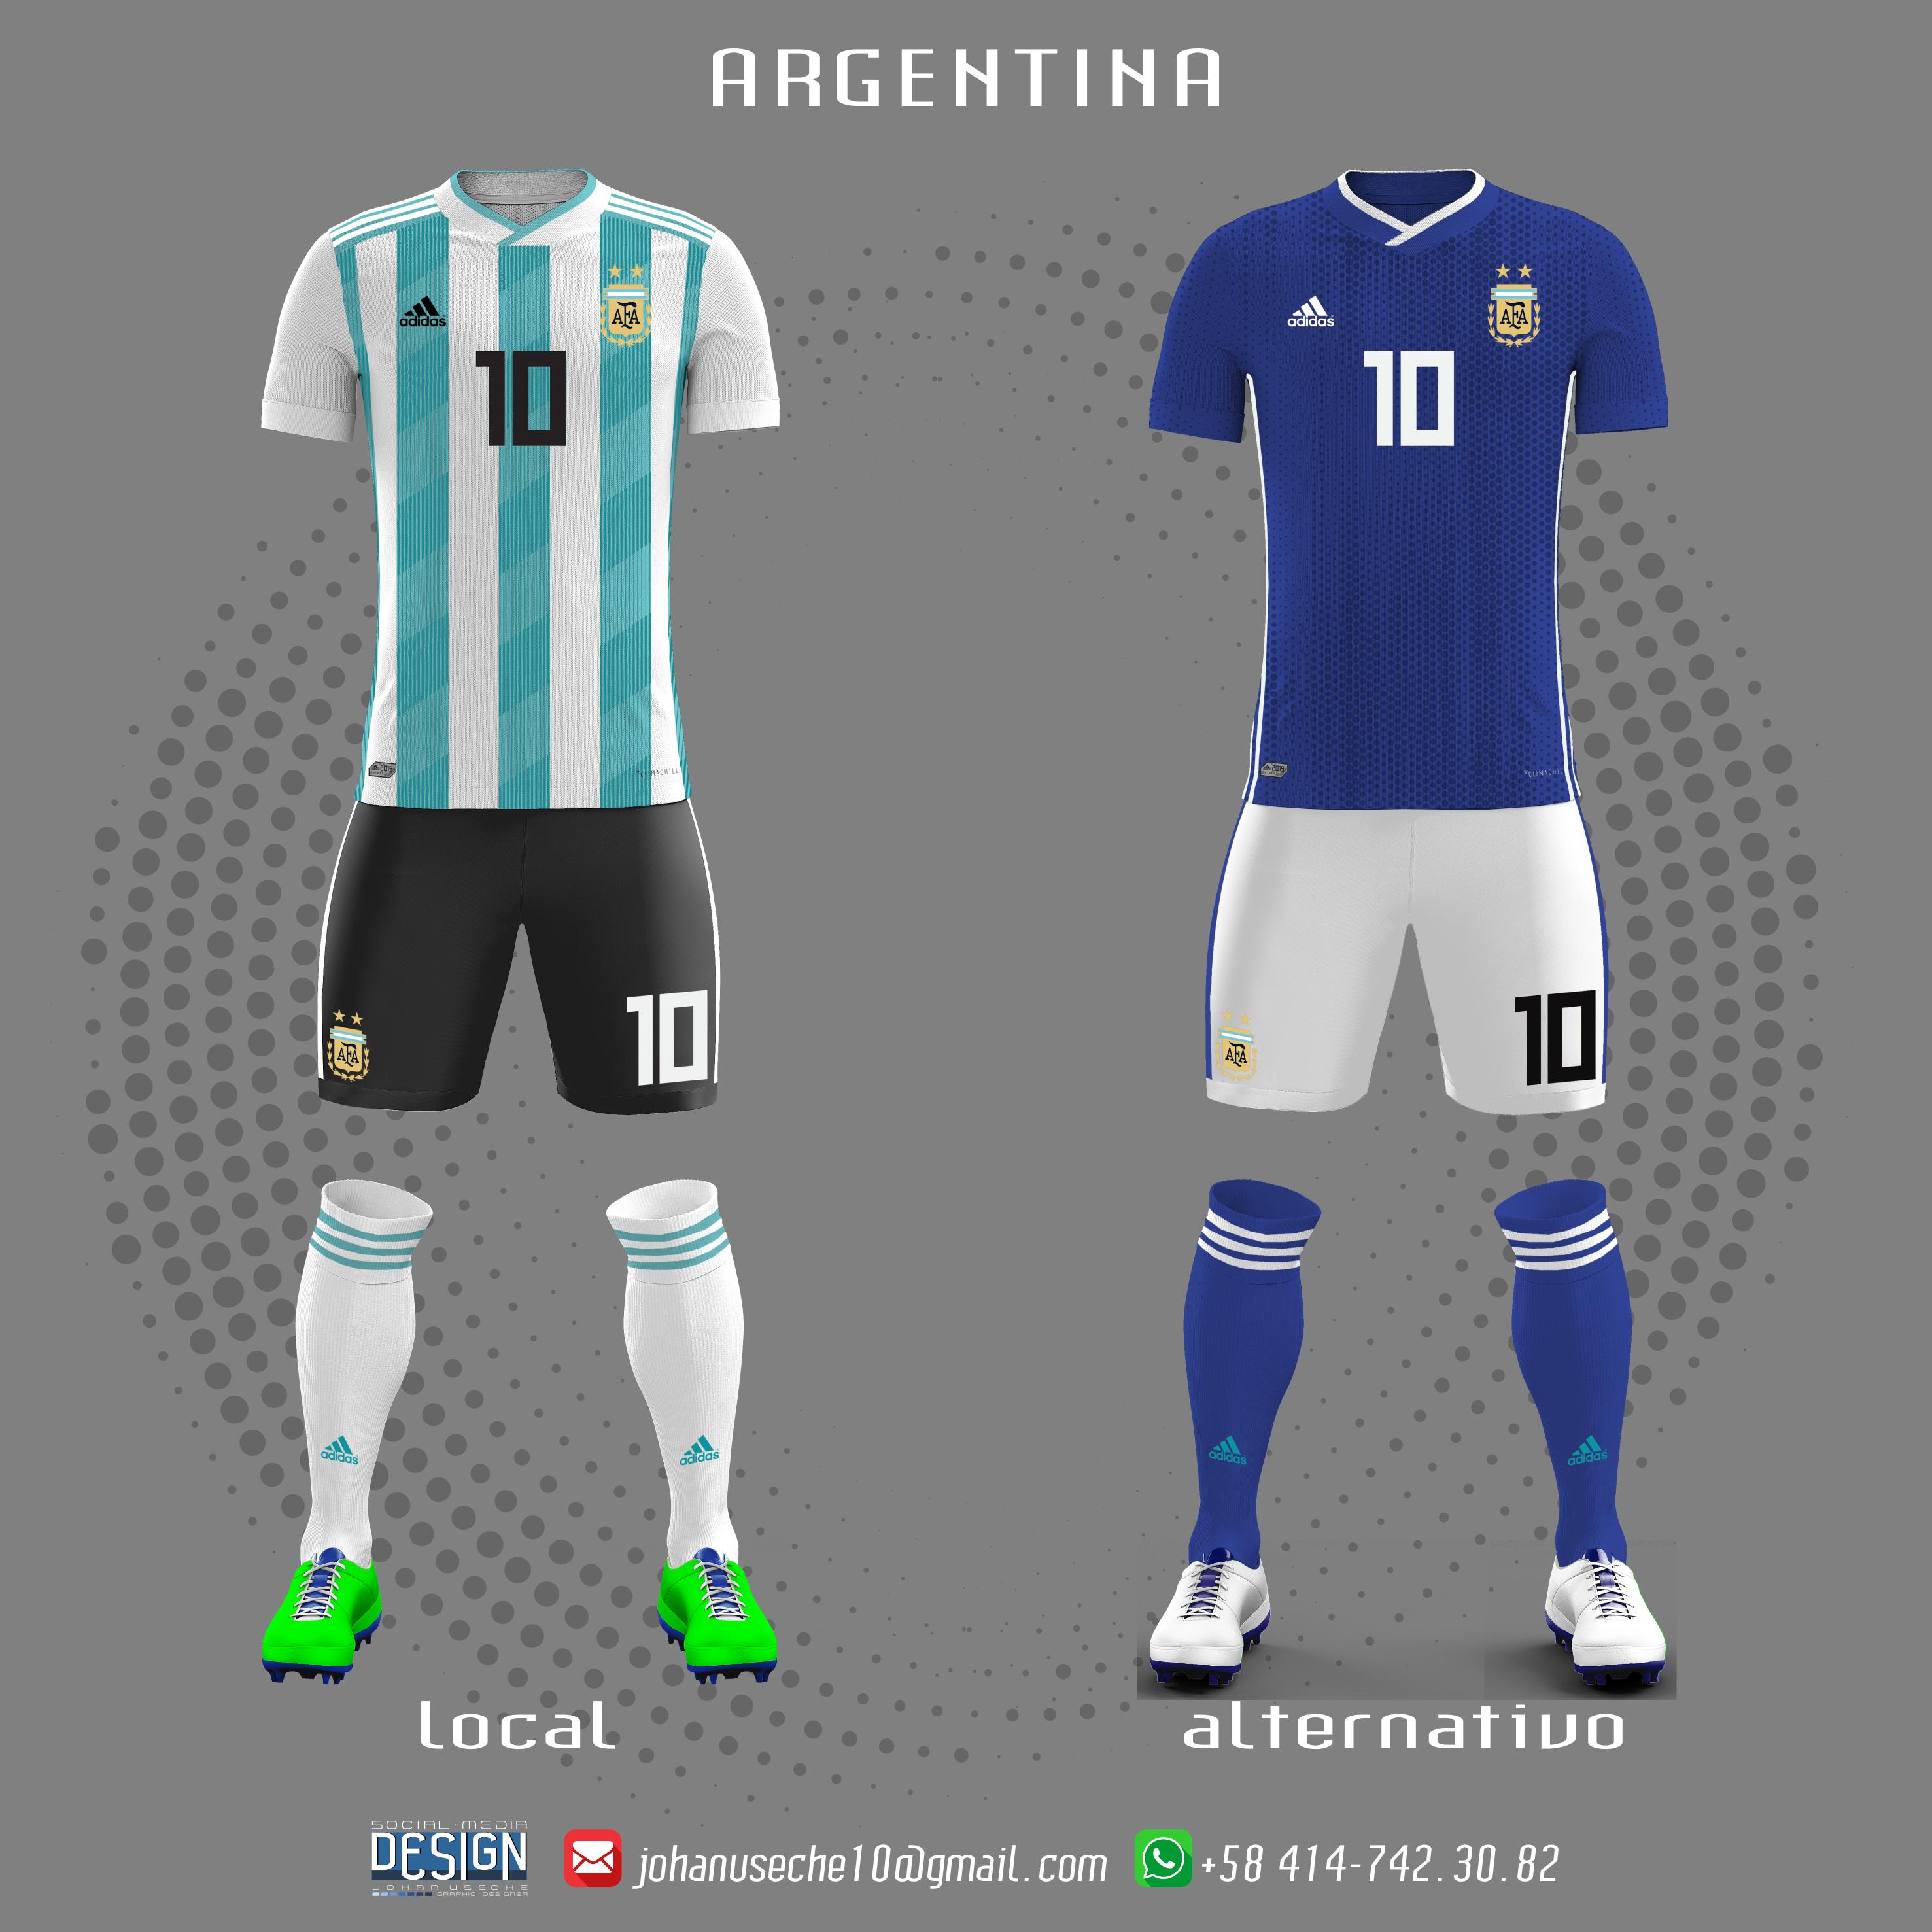 0f67b7032 kit Argentina copa américa 2019 (no oficial)